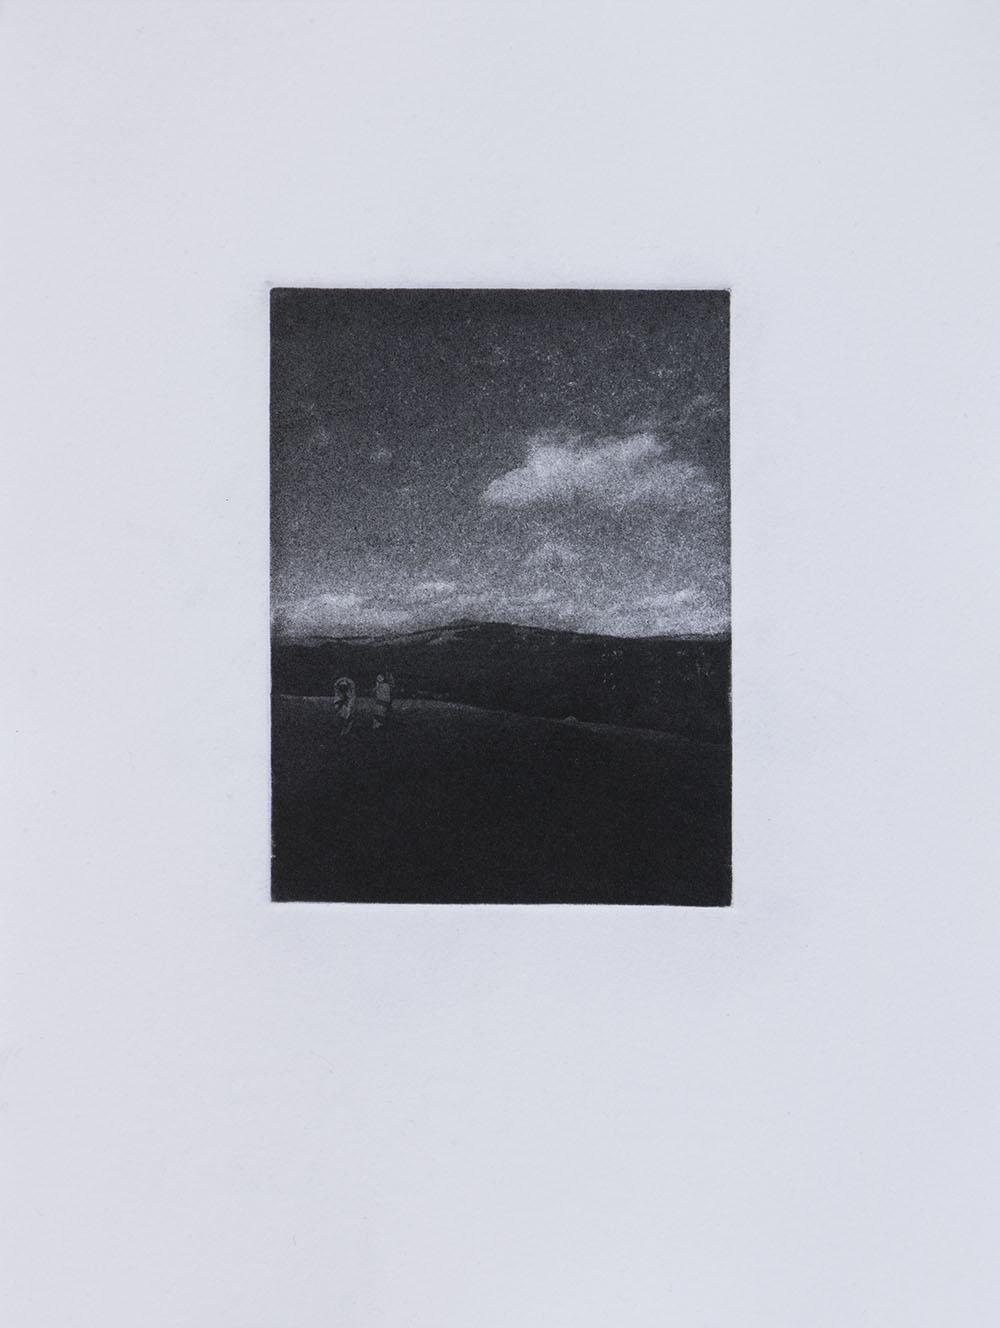 Inga Somdyala The Righteous Path 2017 Etching - Edition of 5 + 3 AP 20,5 x 15,5 cm